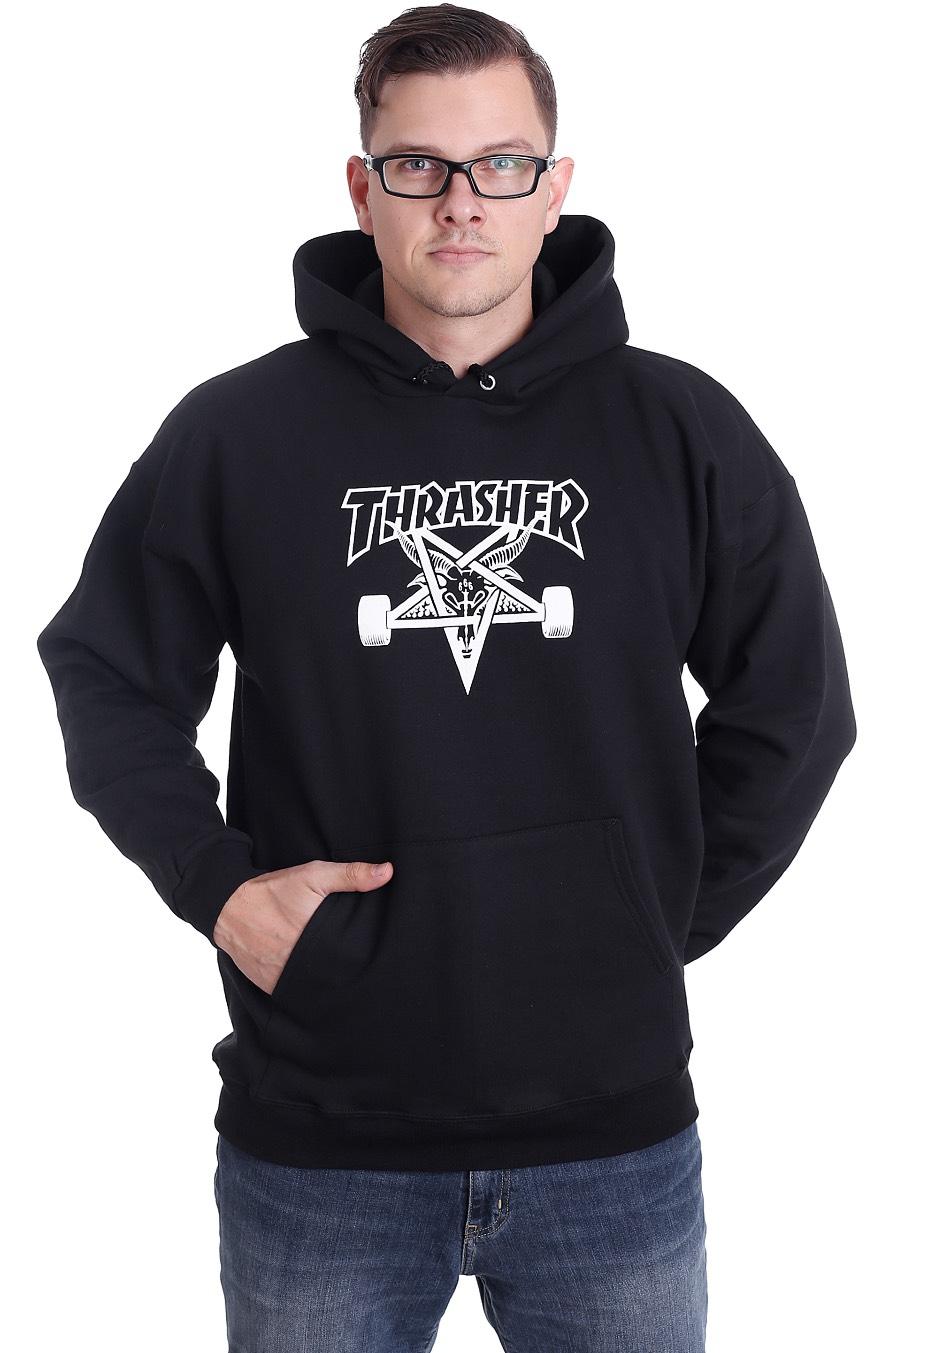 Thrasher - Thrasher Skate Goat - Hoodie - Streetwear Shop - Impericon.com UK f9066adec6d6